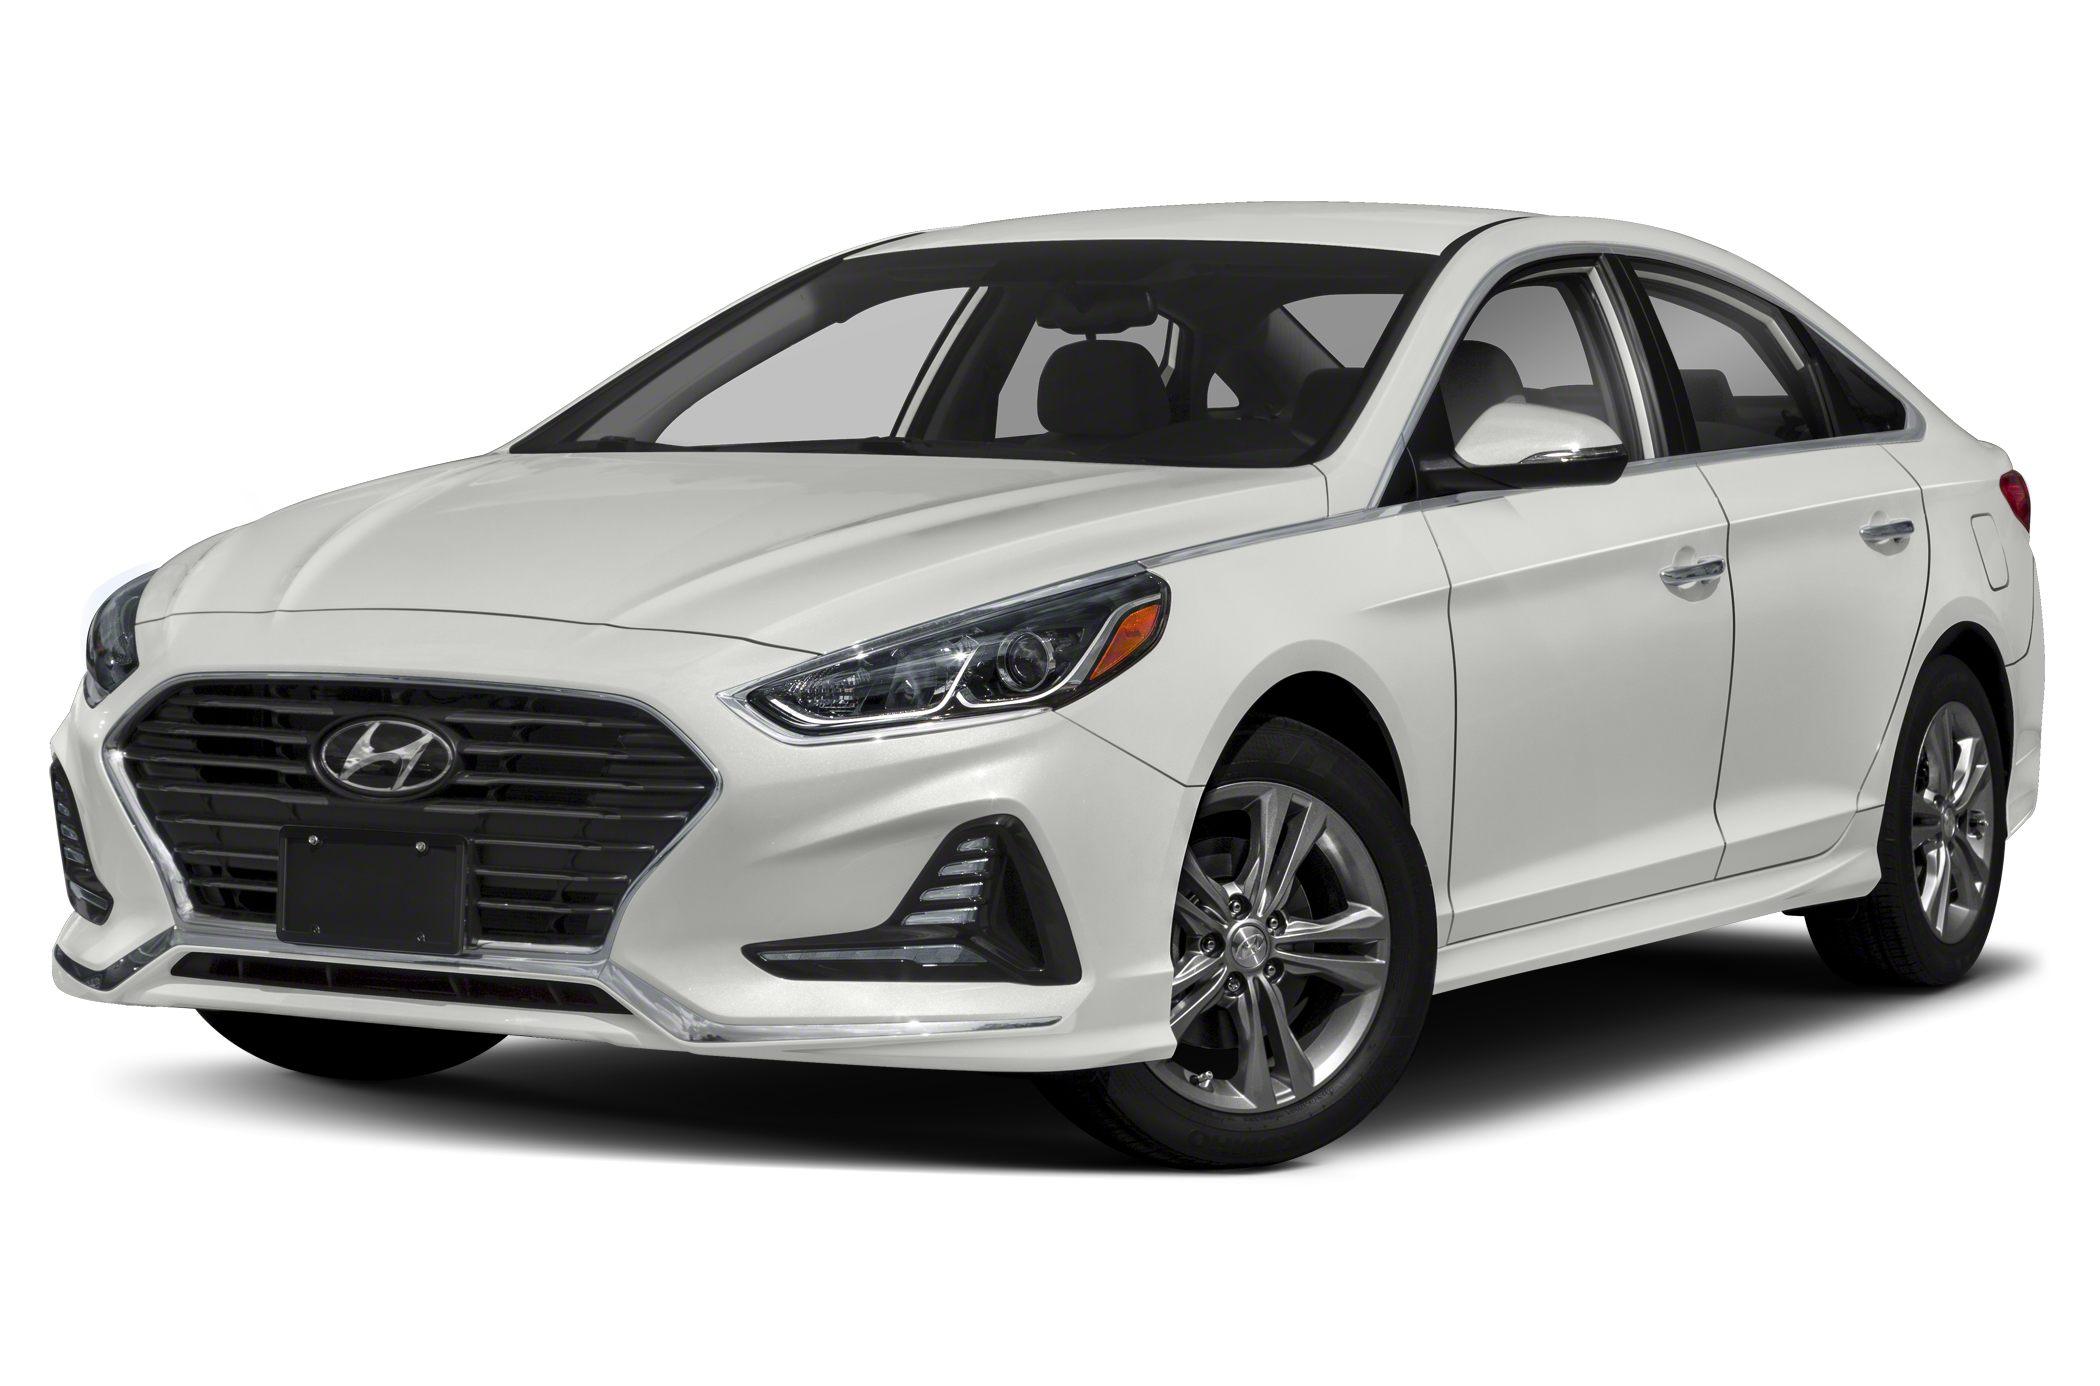 2019 Hyundai Sonata Deals Prices Incentives Amp Leases